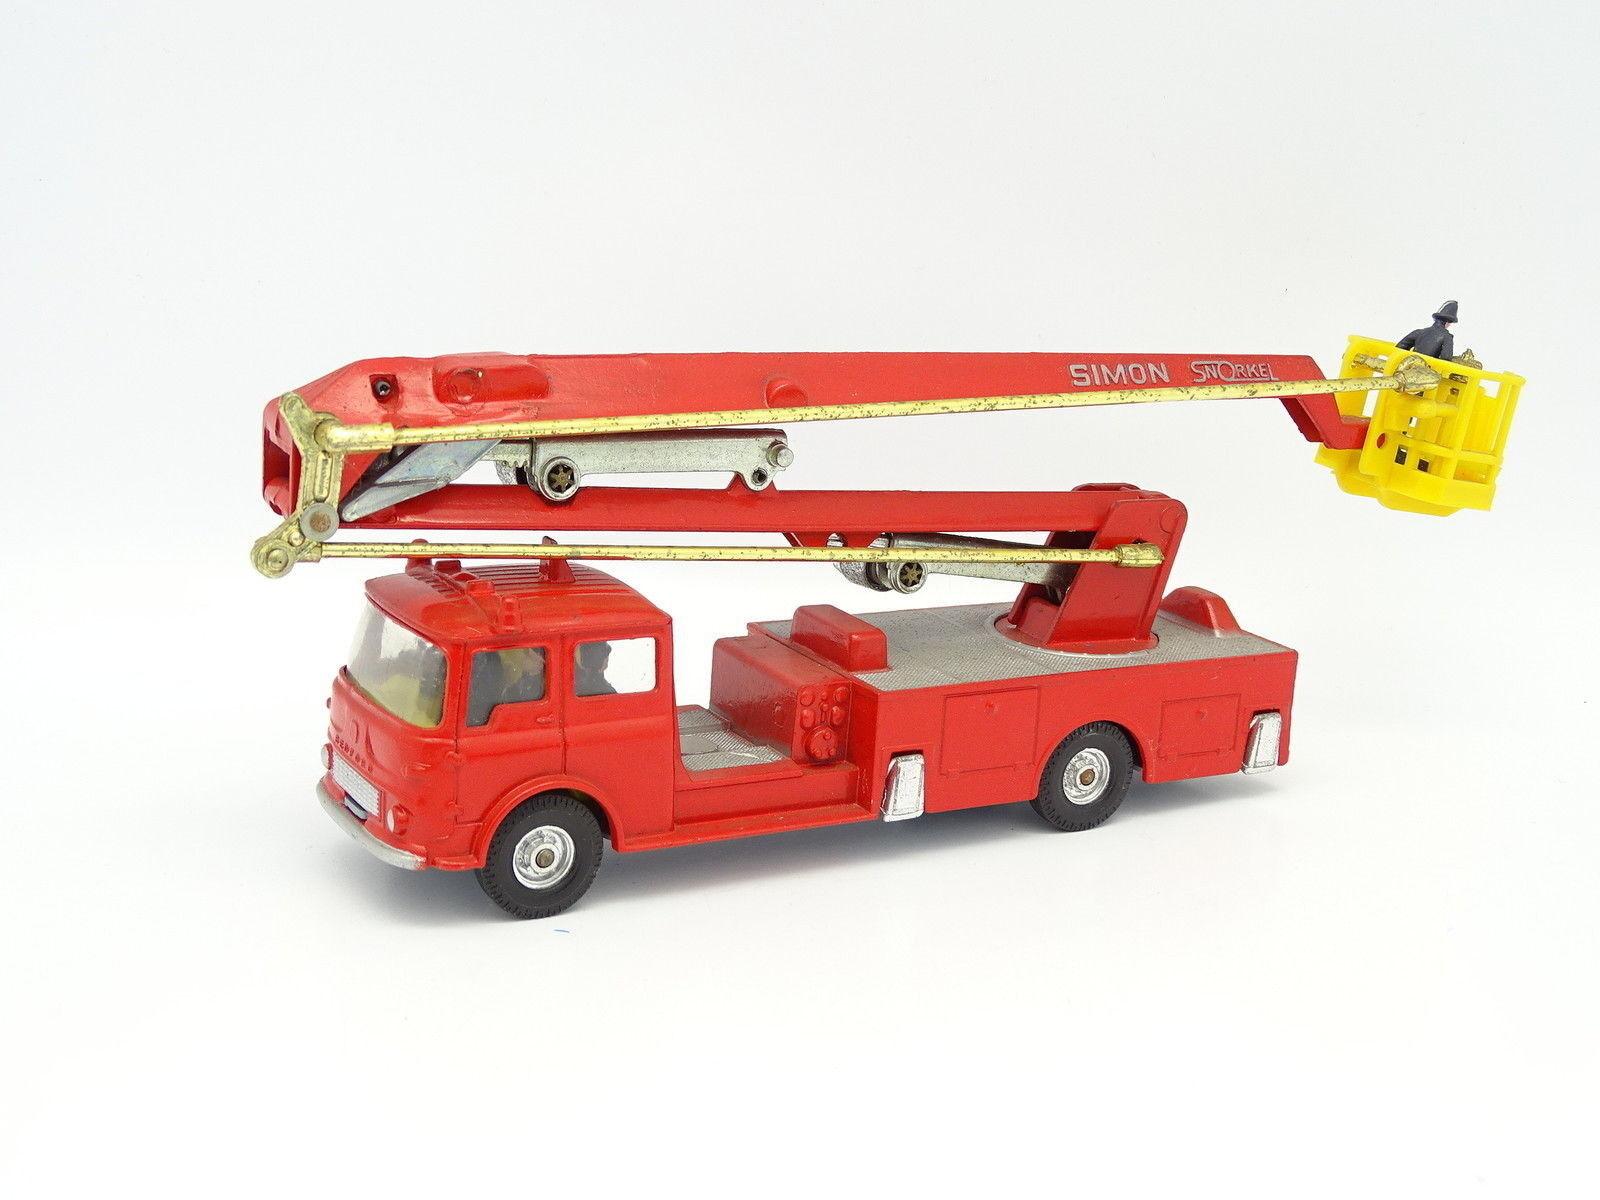 Corgi Toys SB 1 50 - Bedford Simon Snorkel Fire Engine  Pompiers